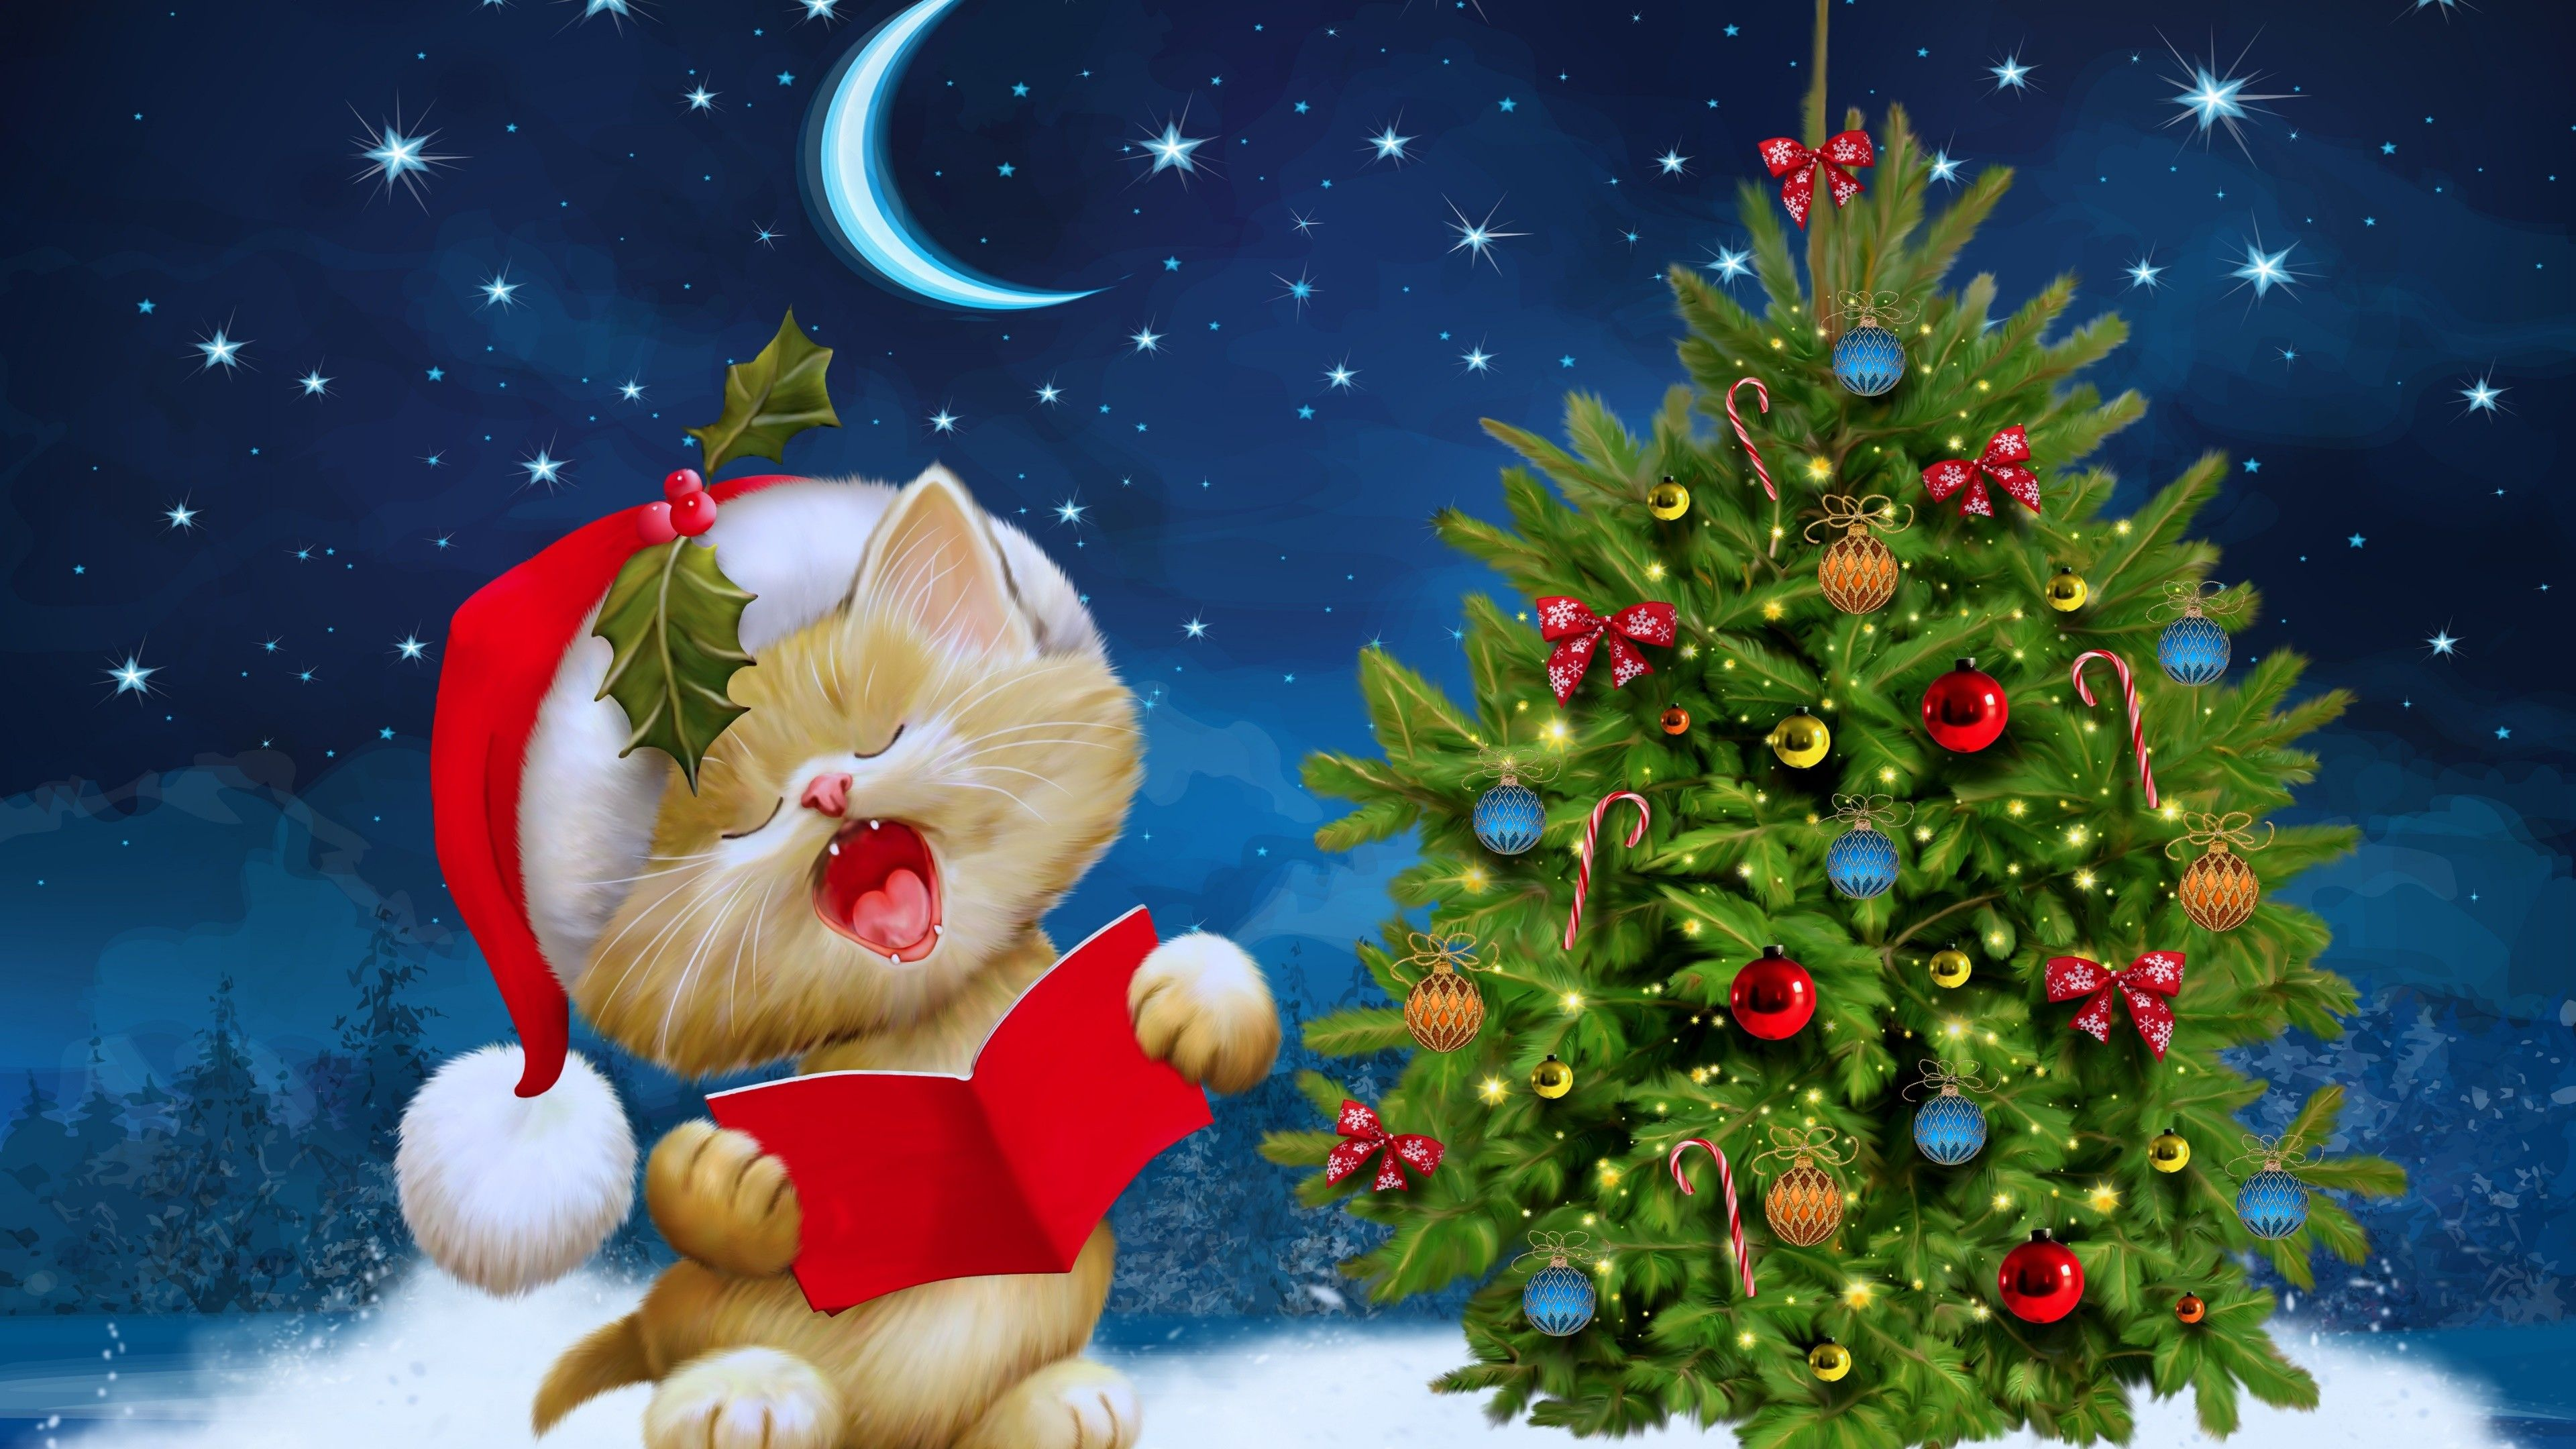 3840x2160 Ultra Hd 4k 3840x2160 Merry Christmas Photos Christmas Wallpaper Hd Merry Christmas Wallpaper